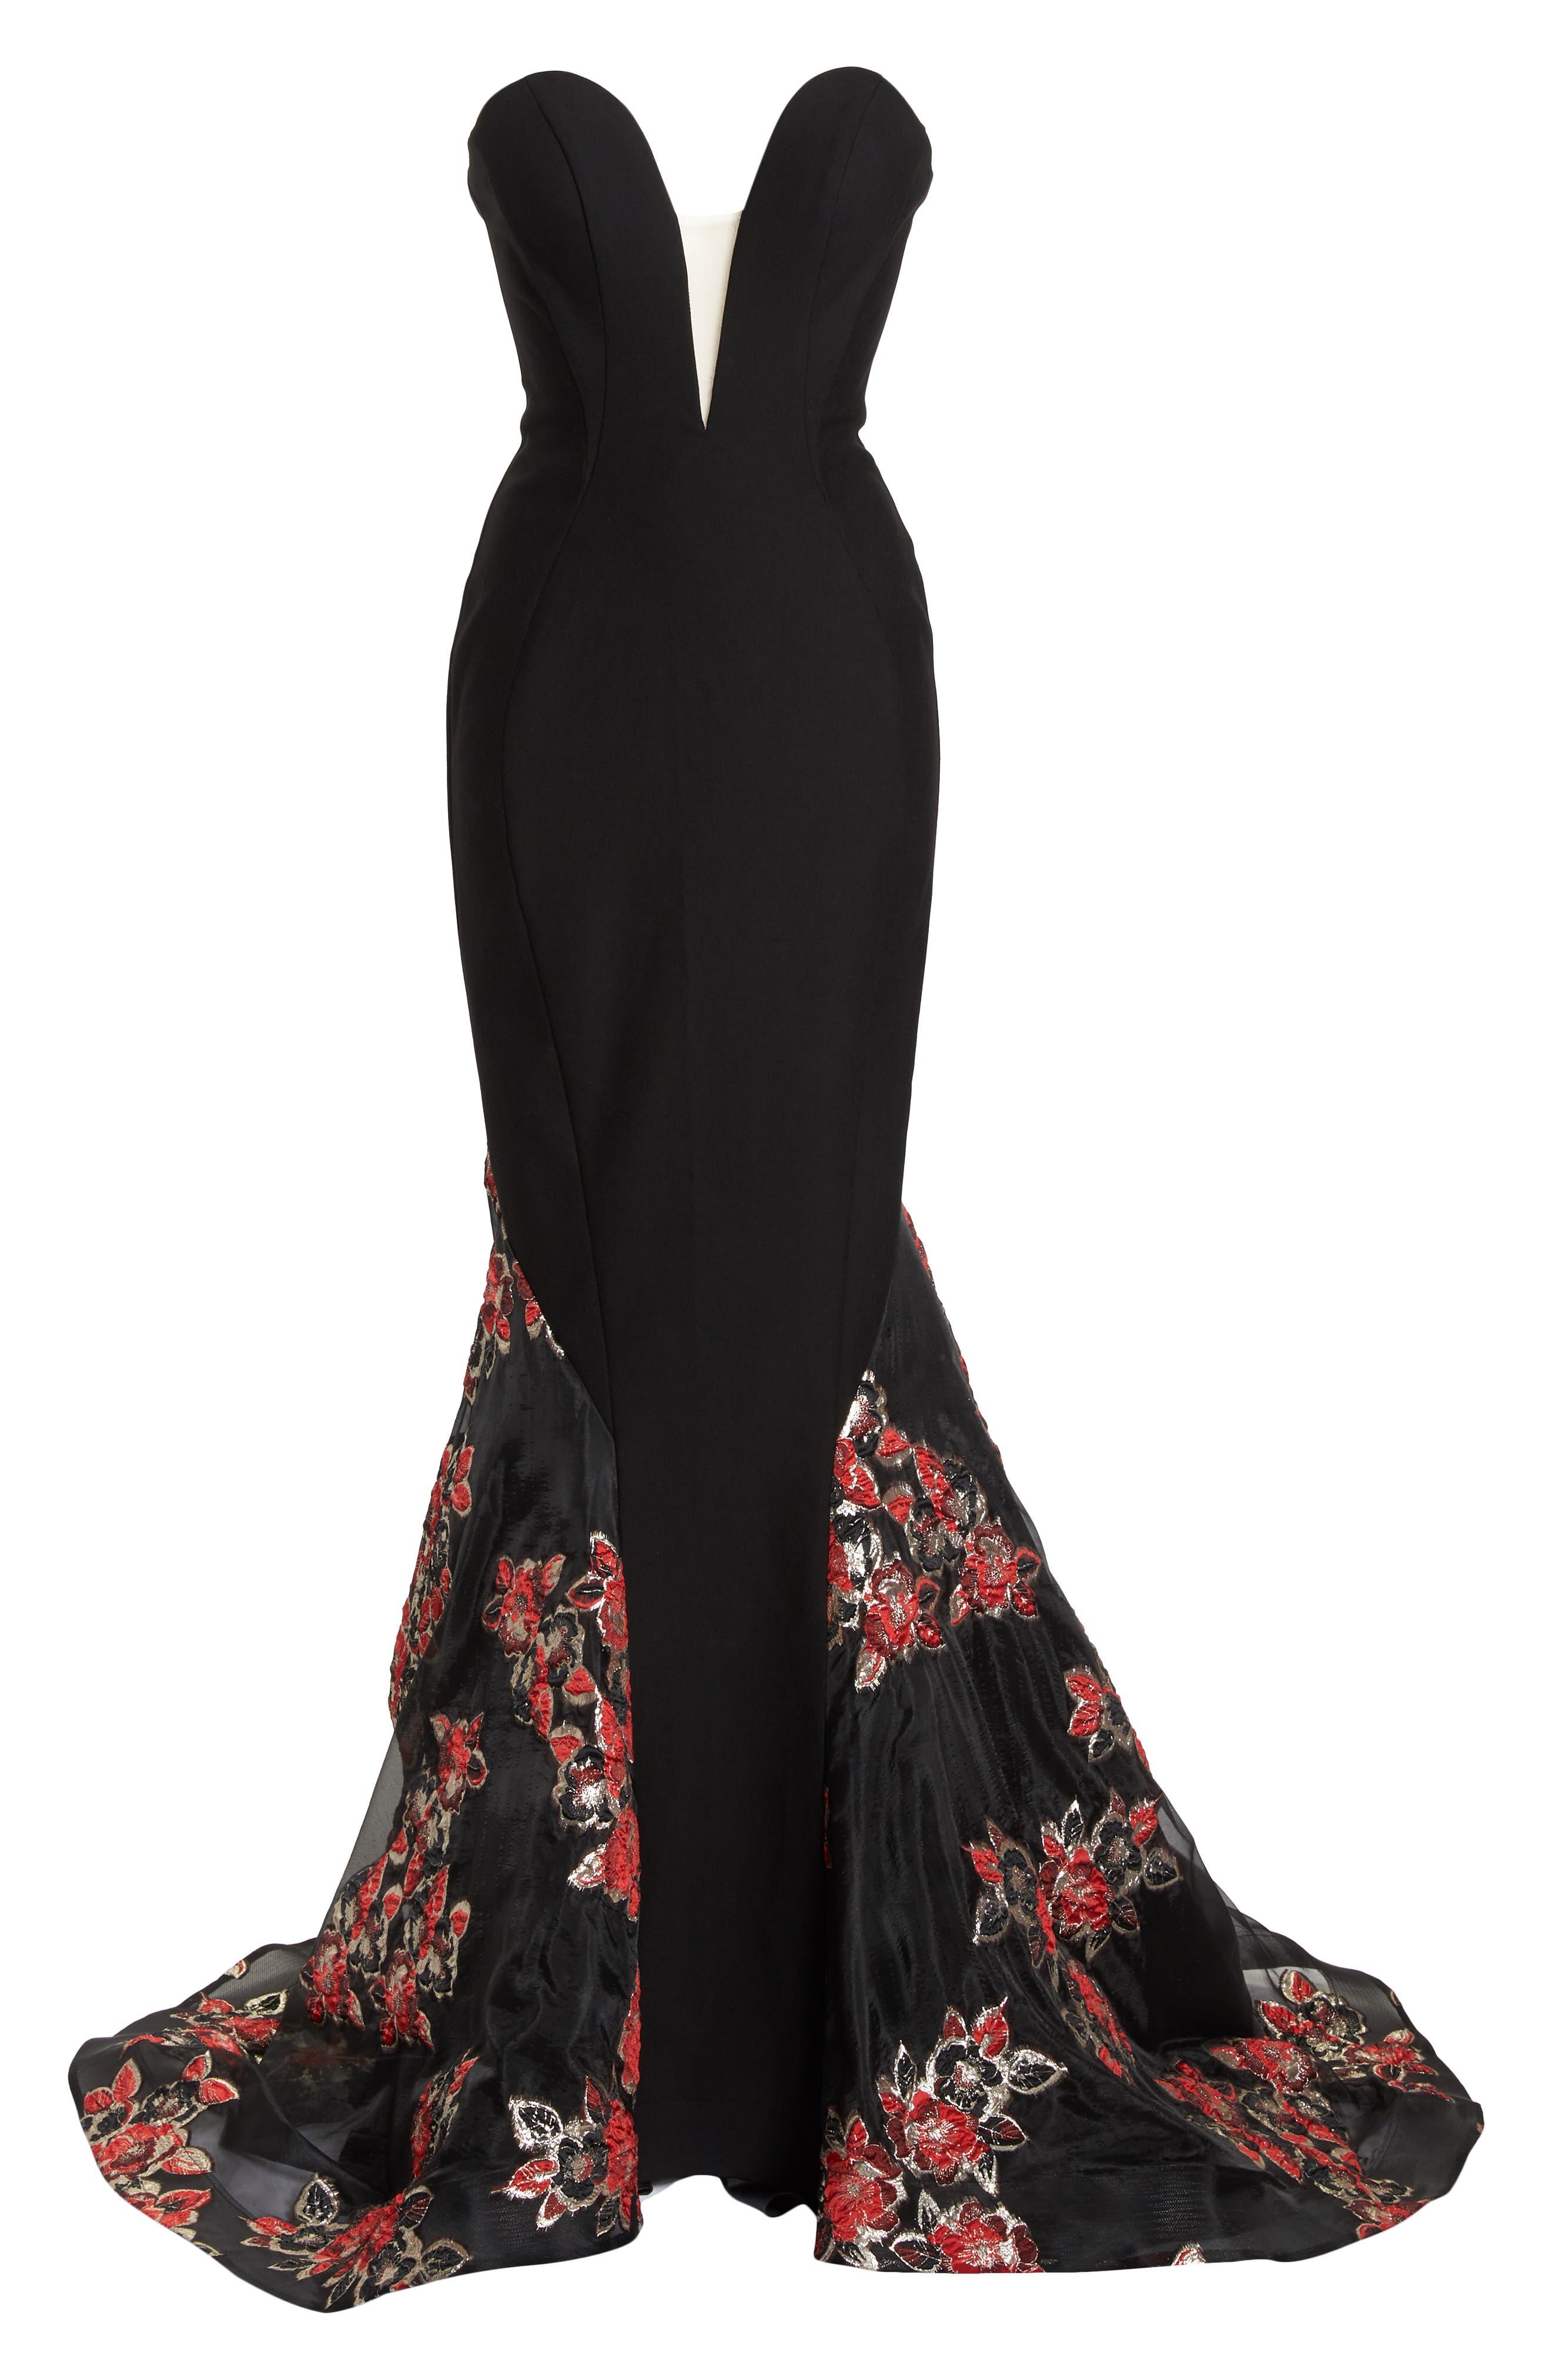 MAC DUGGAL, Plunge Floral Jacquard Mermaid Gown, Alternate thumbnail 6, color, BLACK